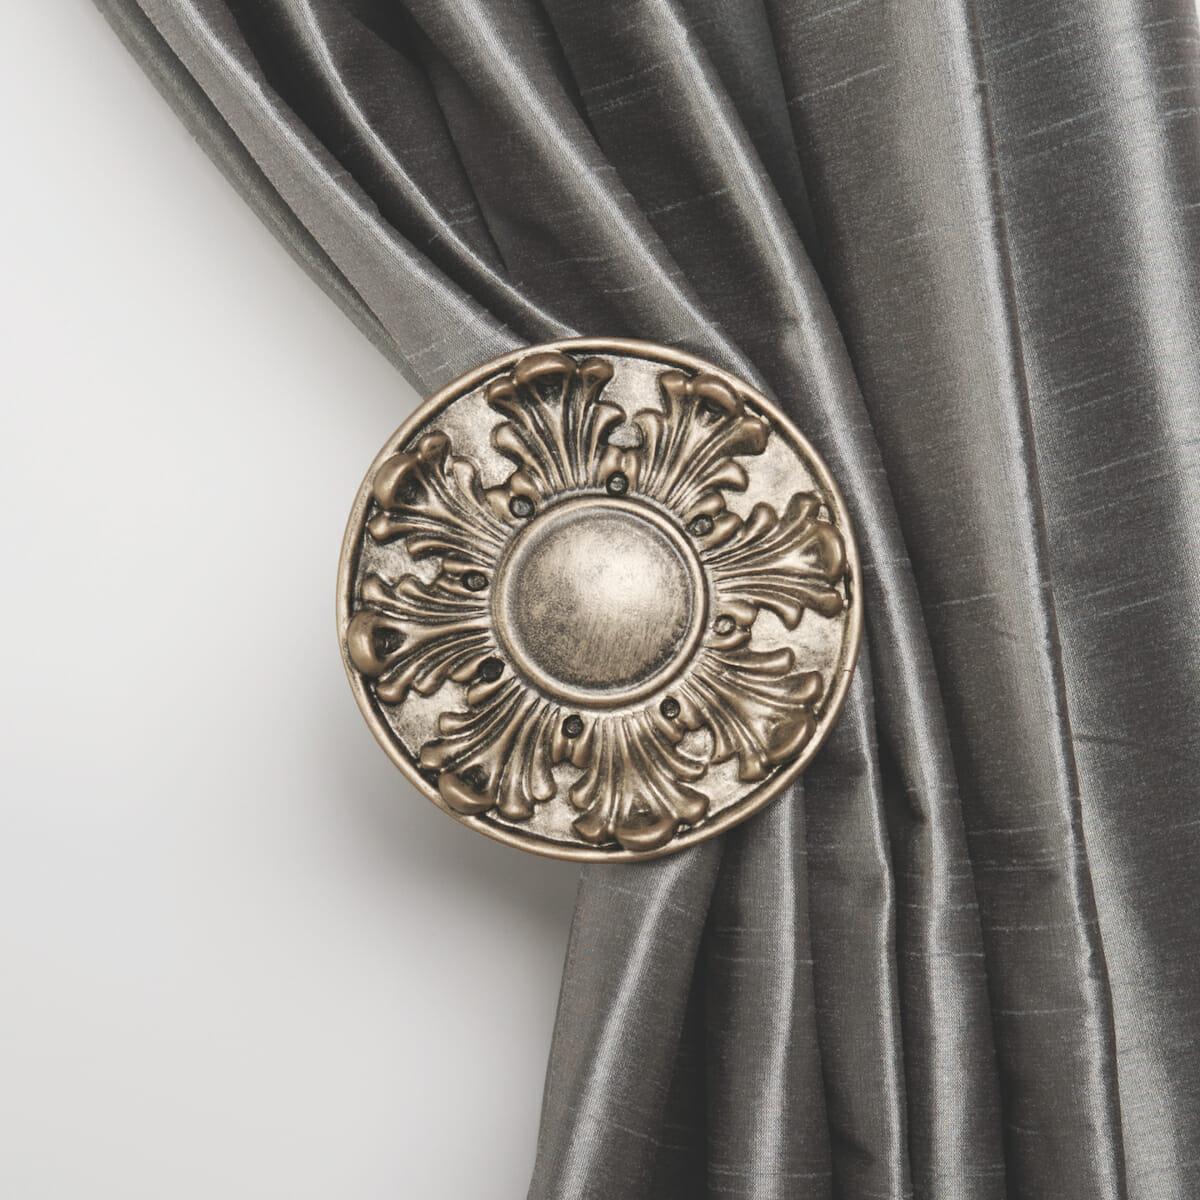 Curtain holdbacks with an elegant flourish put the finishing touch.